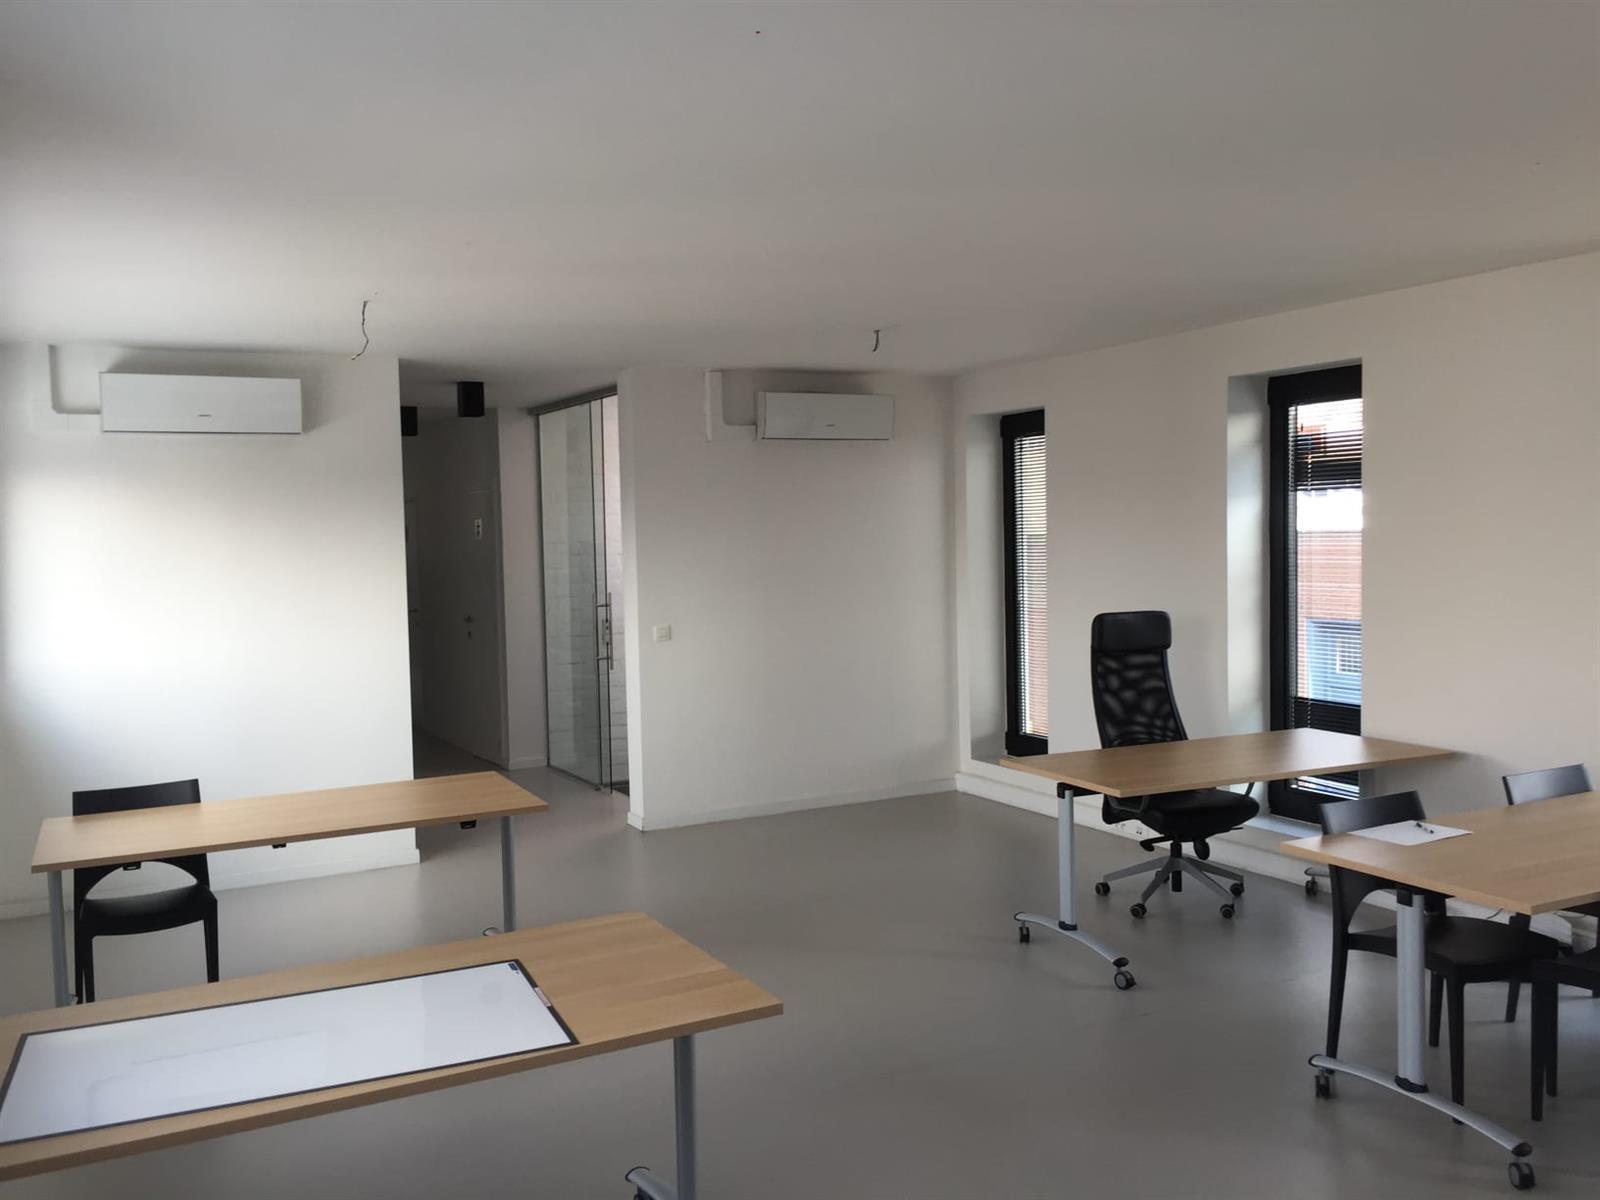 kantoor te huur K003 - Middelmolenlaan 96, 2100 Antwerpen Deurne, België 10